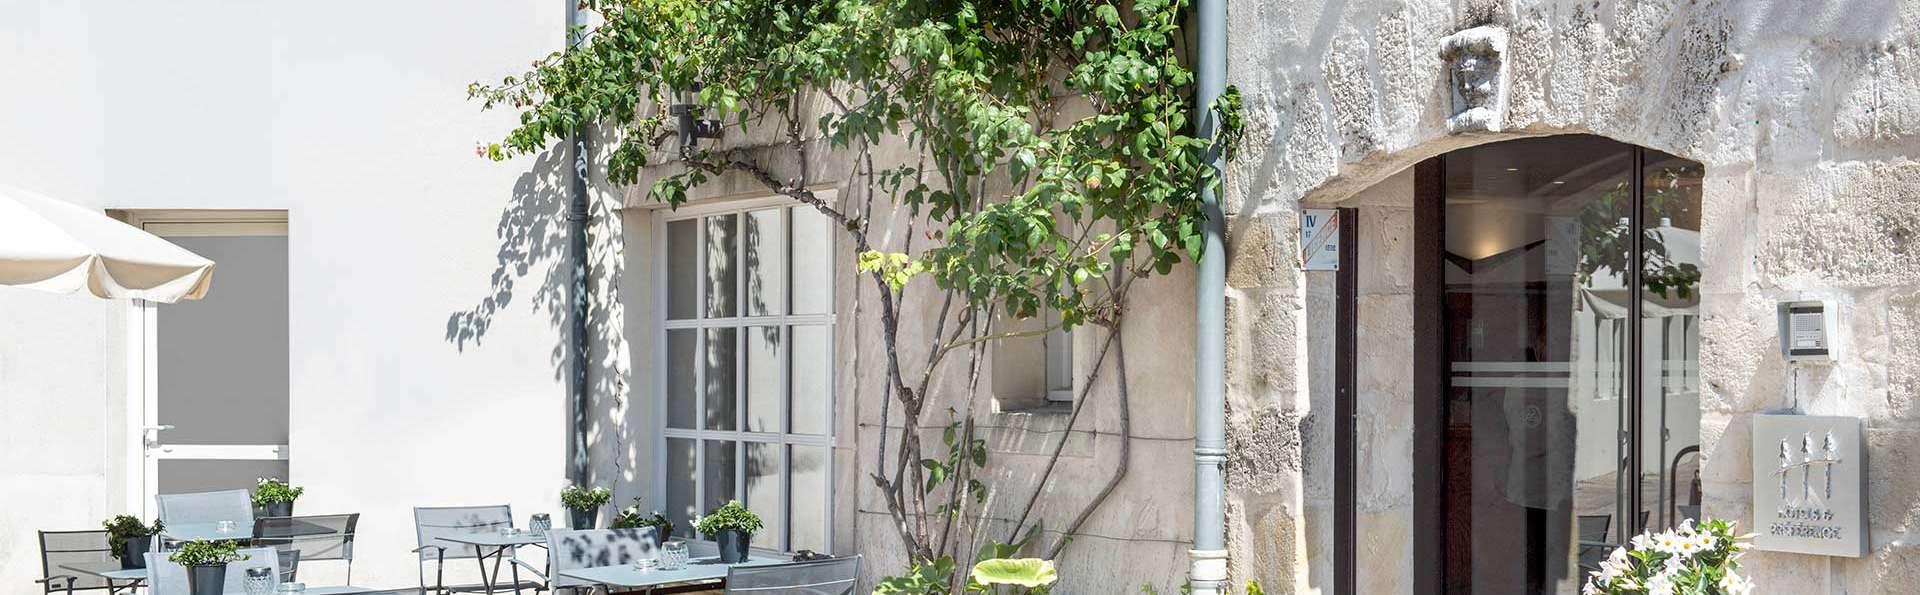 Hôtel Saint Nicolas - EDIT_NEW_FRONT_02.jpg